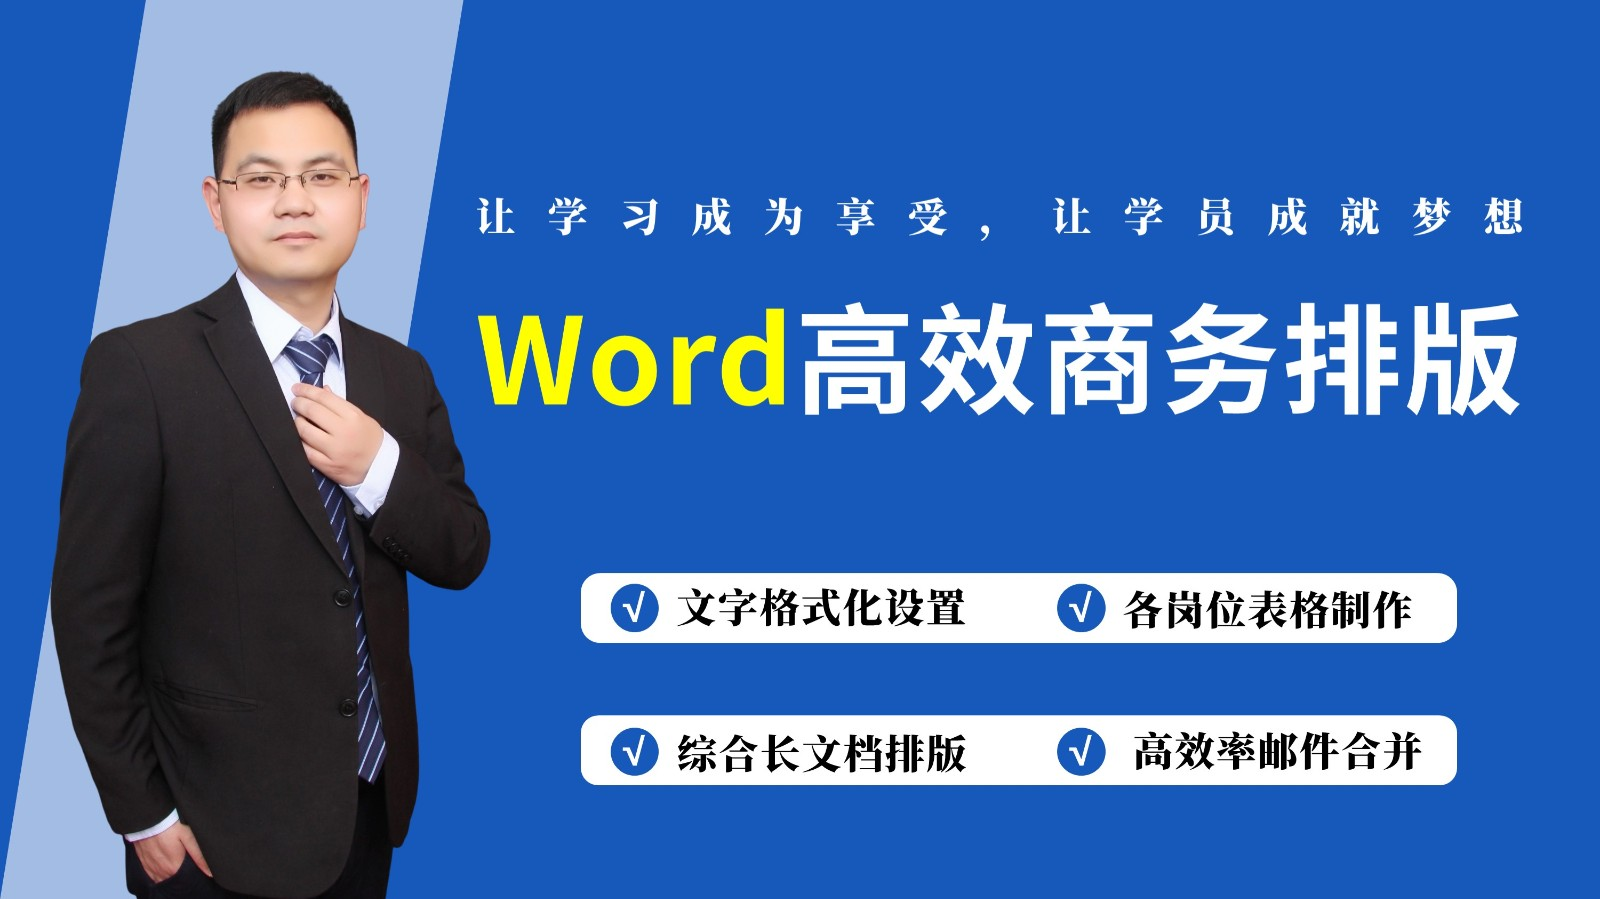 Word高级商务办公应用 文字排版 表格制作 邮件合并 标书合同论文